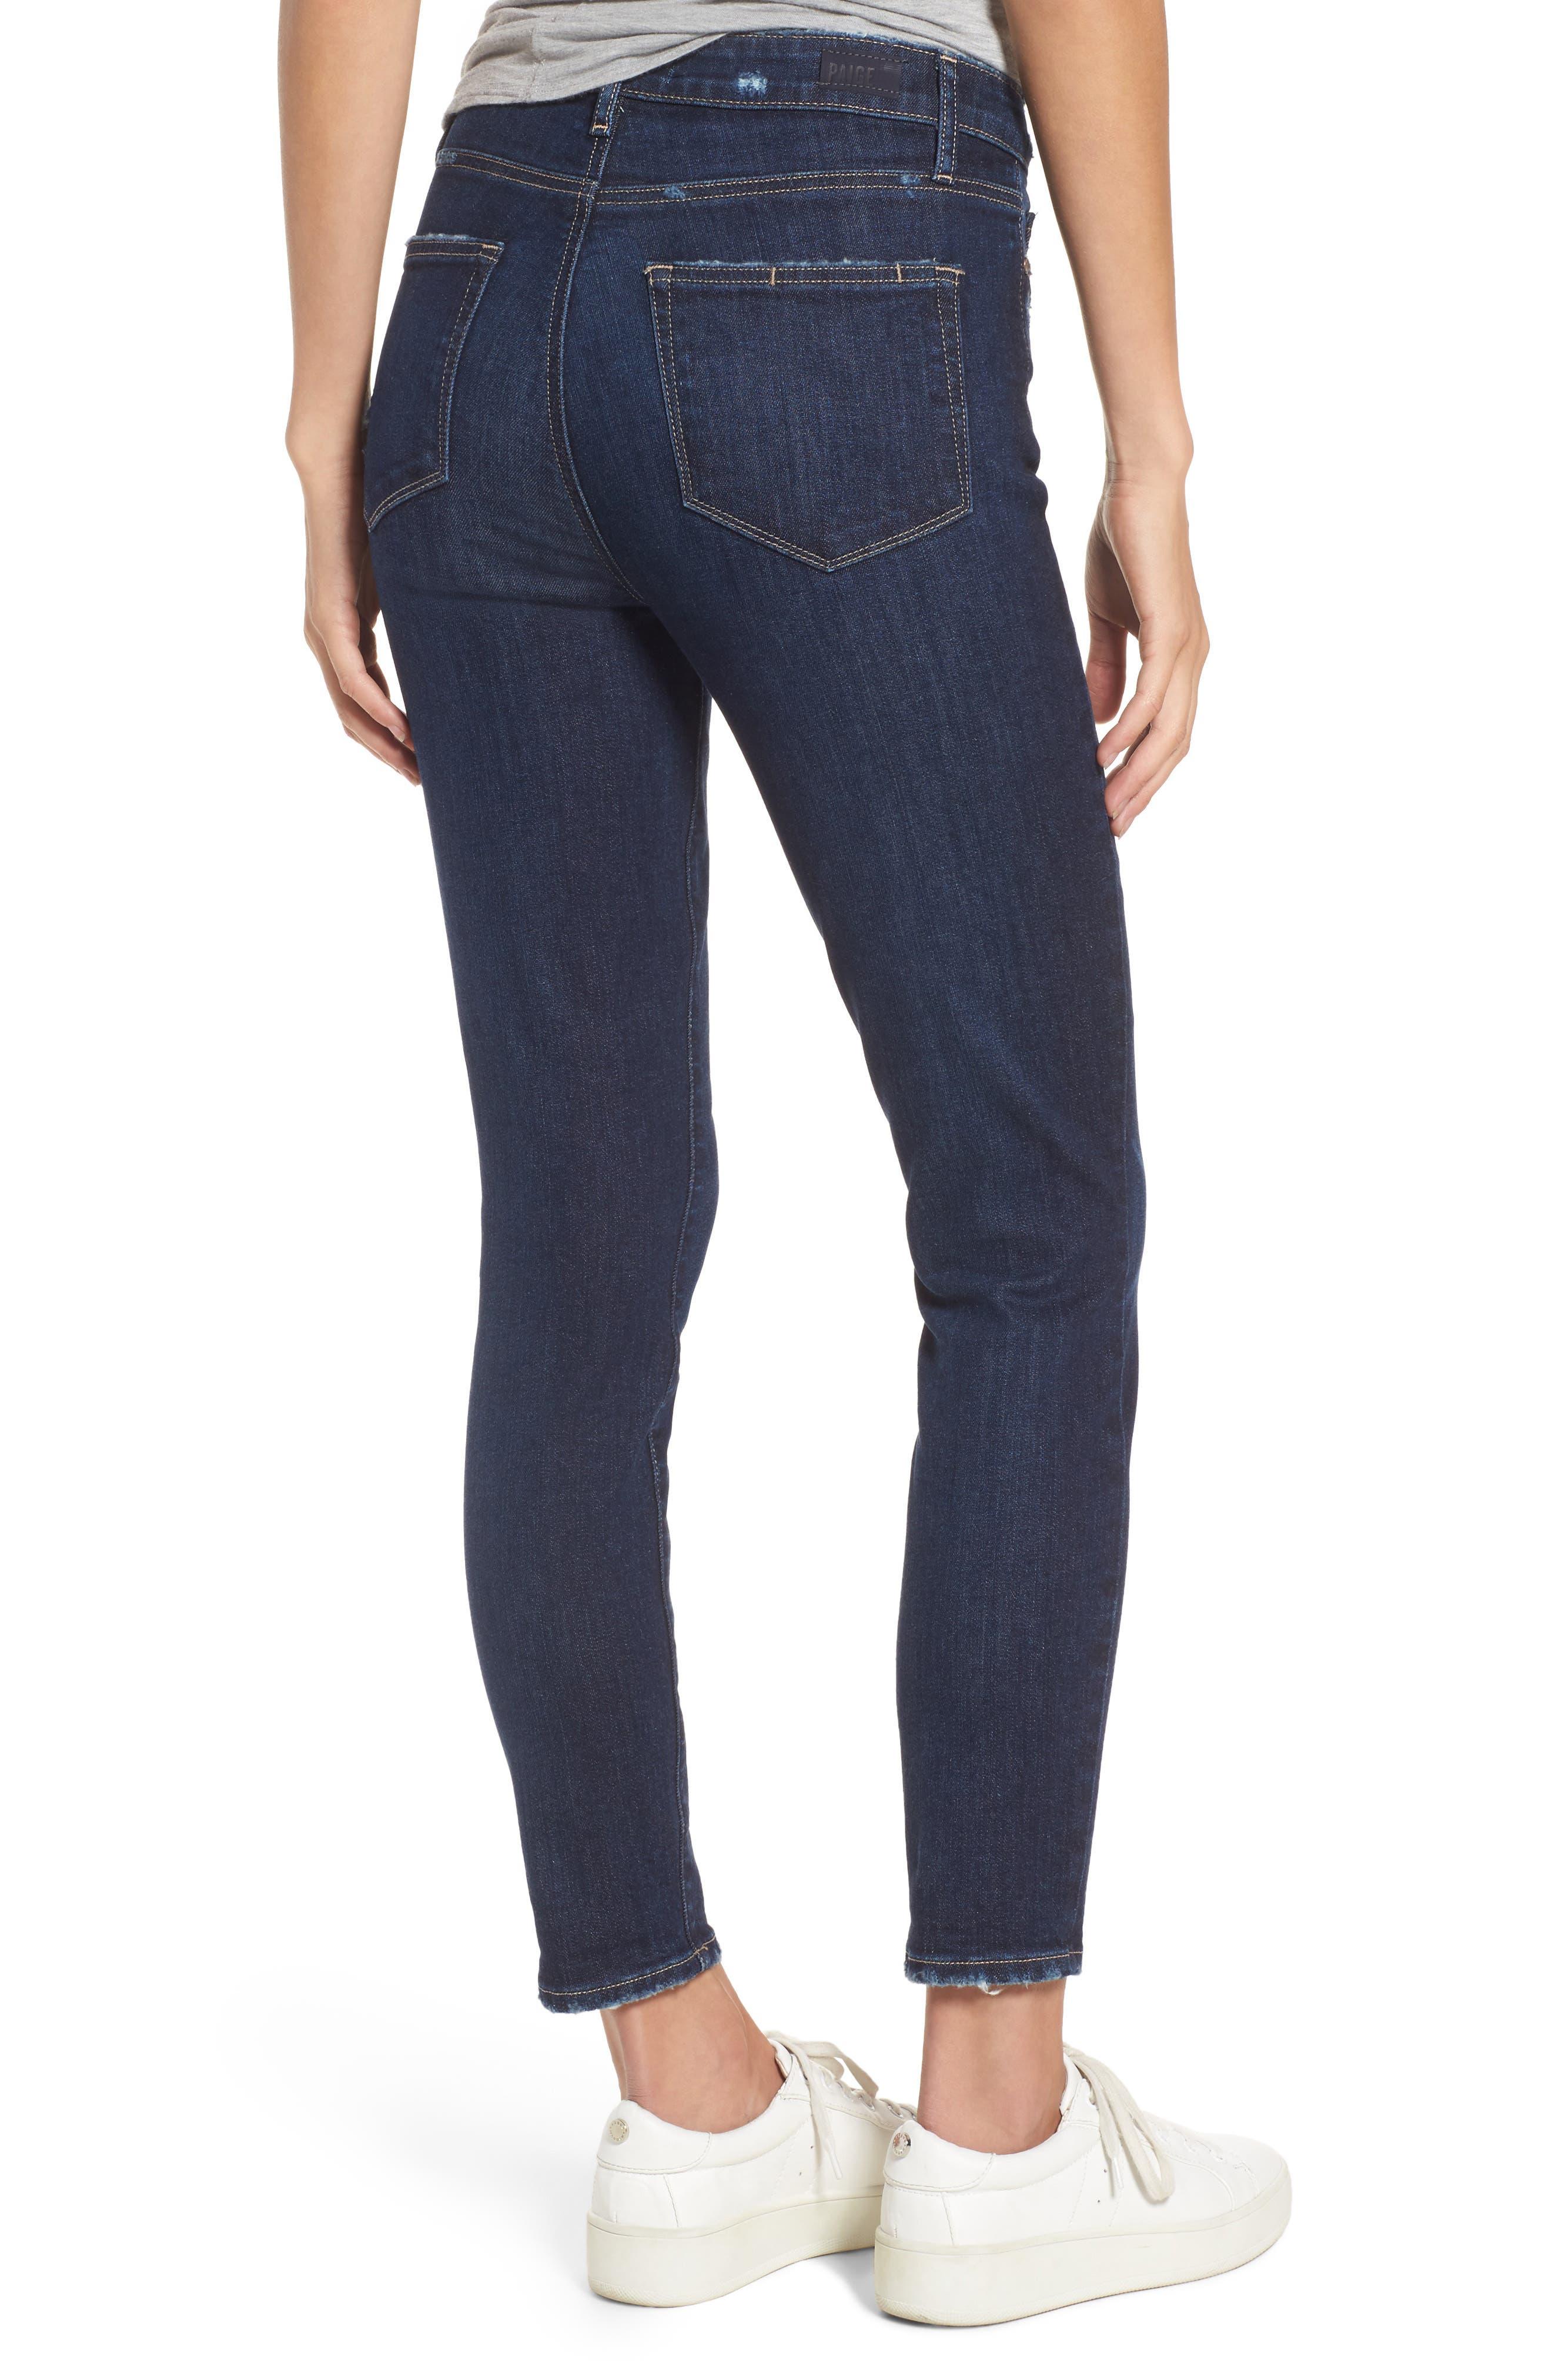 Margot High Waist Ankle Skinny Jeans,                             Alternate thumbnail 2, color,                             Davidson Destructed